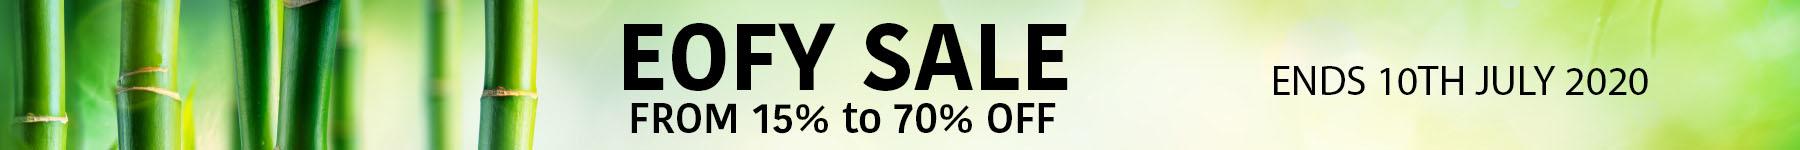 eofy sale banner